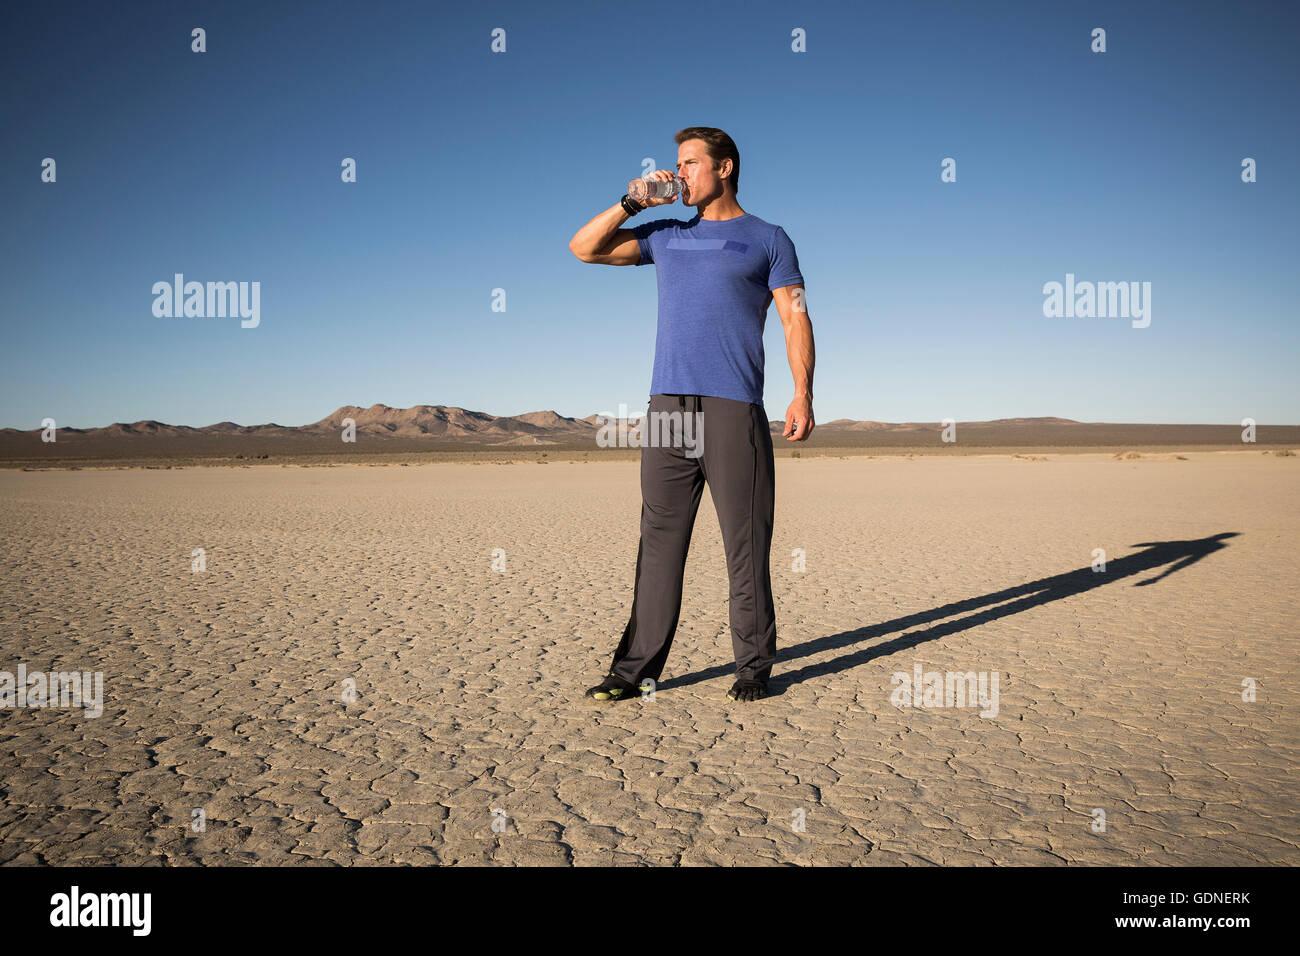 Man training, drinking bottled water on dry lake bed, El Mirage, California, USA - Stock Image